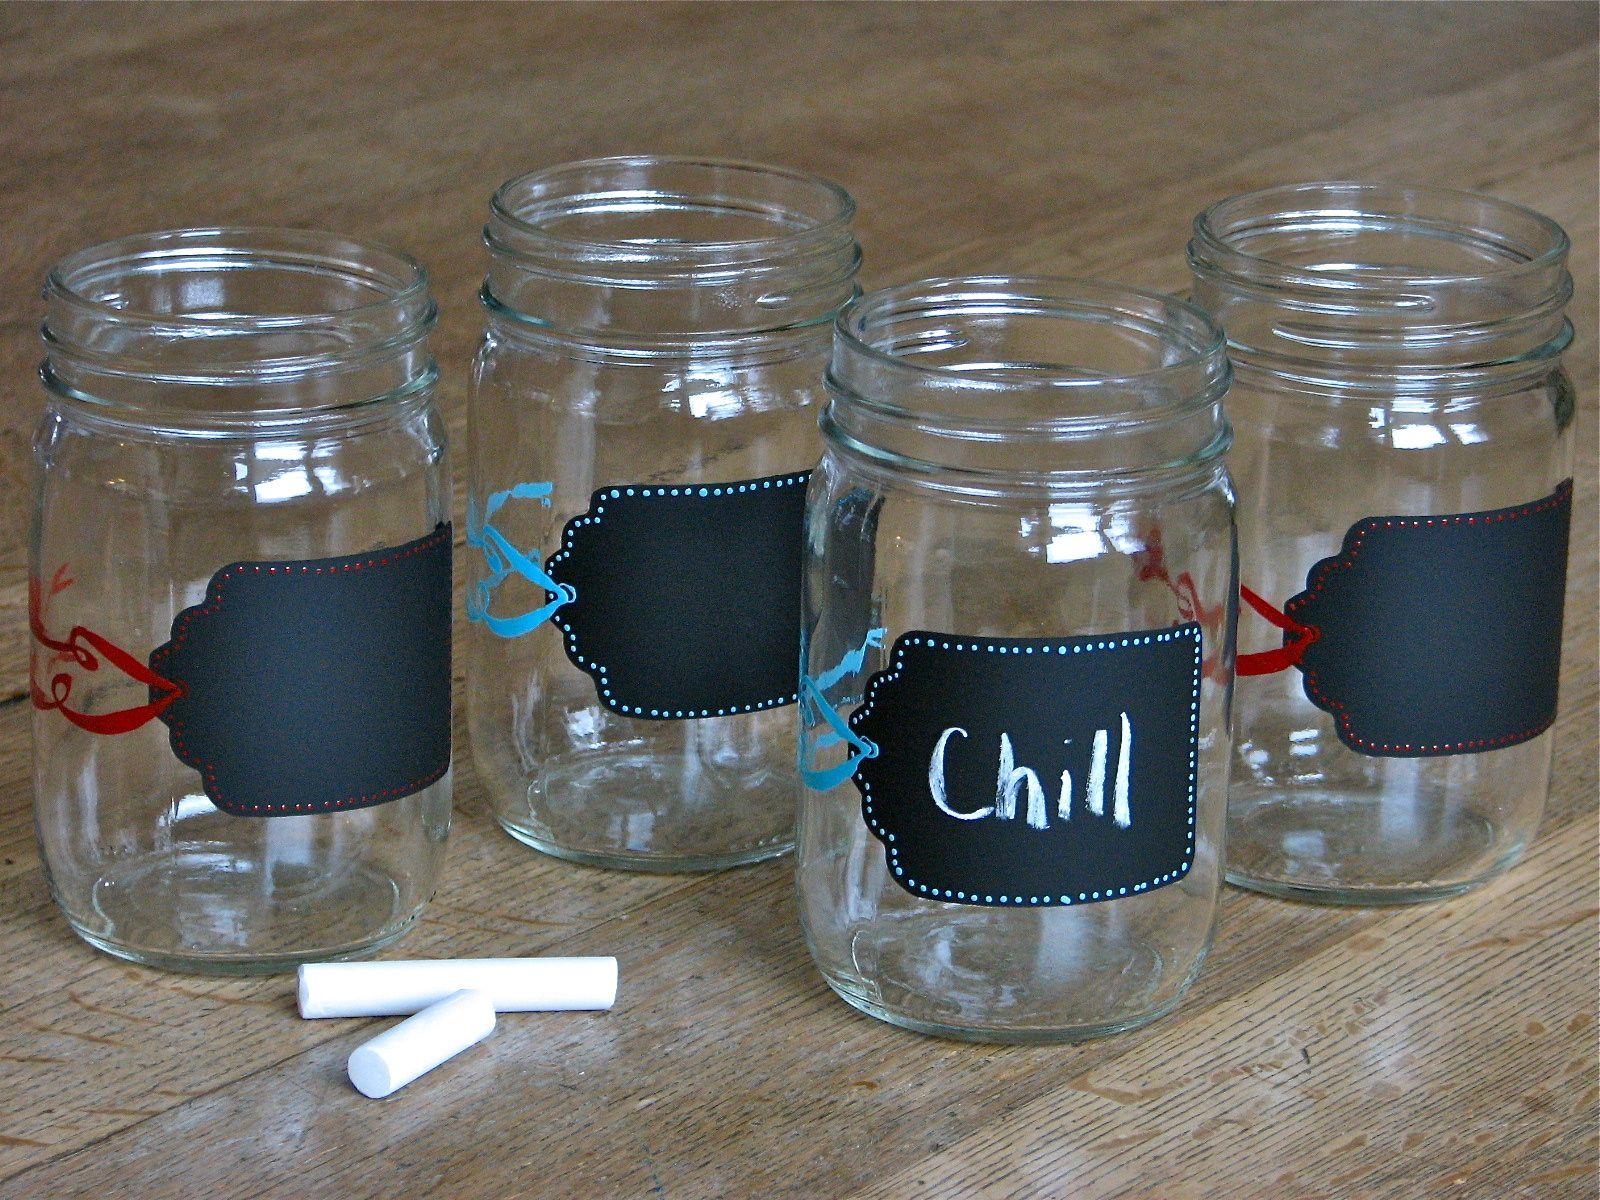 Hand Painted Chalkboard Drink Jars Dishwasher Safe Too Each Jar Comes With A Black Lid Drinking Jars Mason Jar Wine Glass Jar